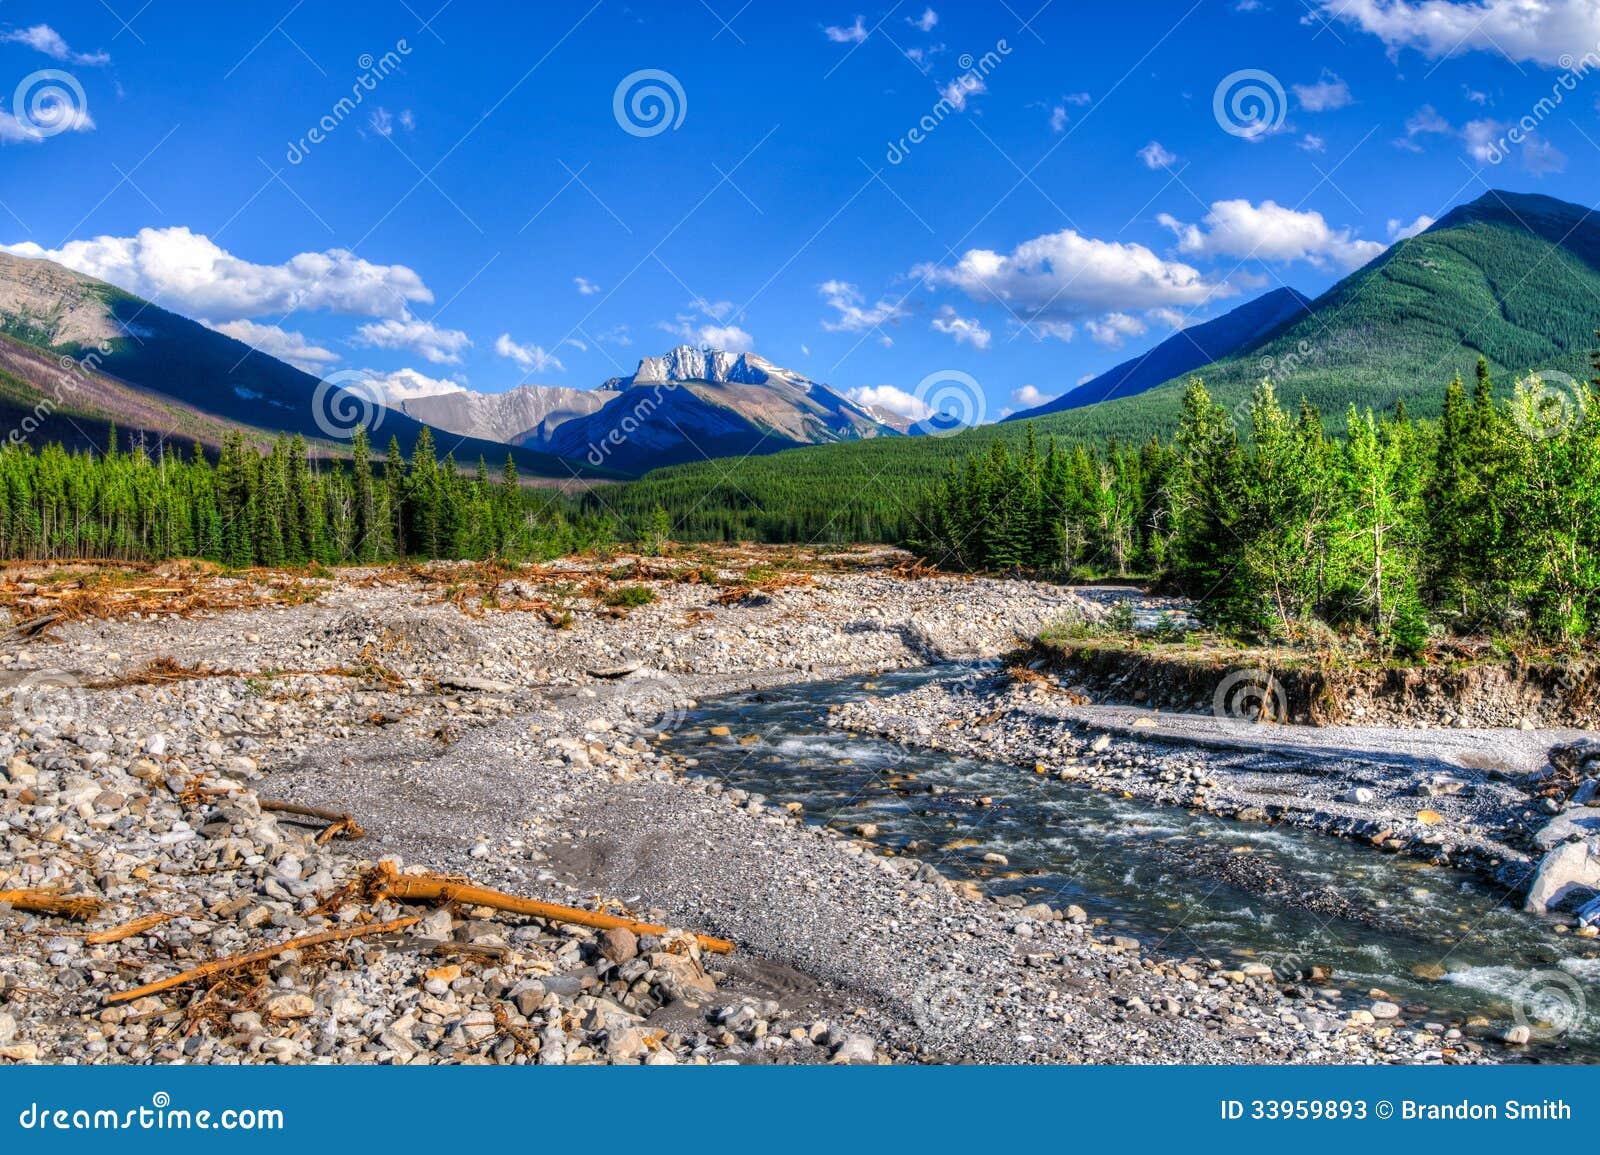 ... Damage on a mountain stream Kananaskis Country Alberta Canada, 2013